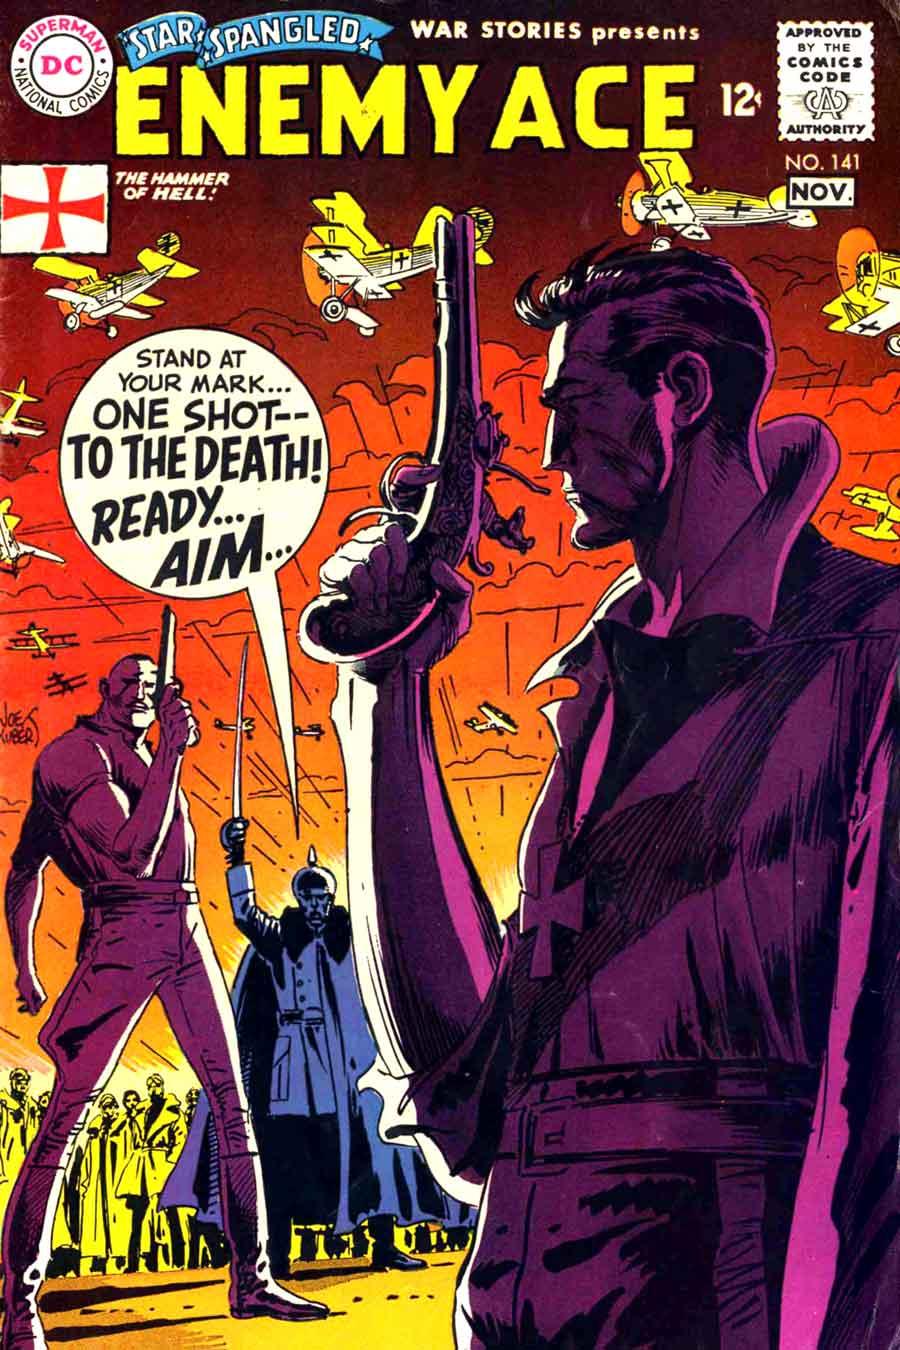 Star Spangled War v1 #141 enemy ace dc comic book cover art by Joe Kubert